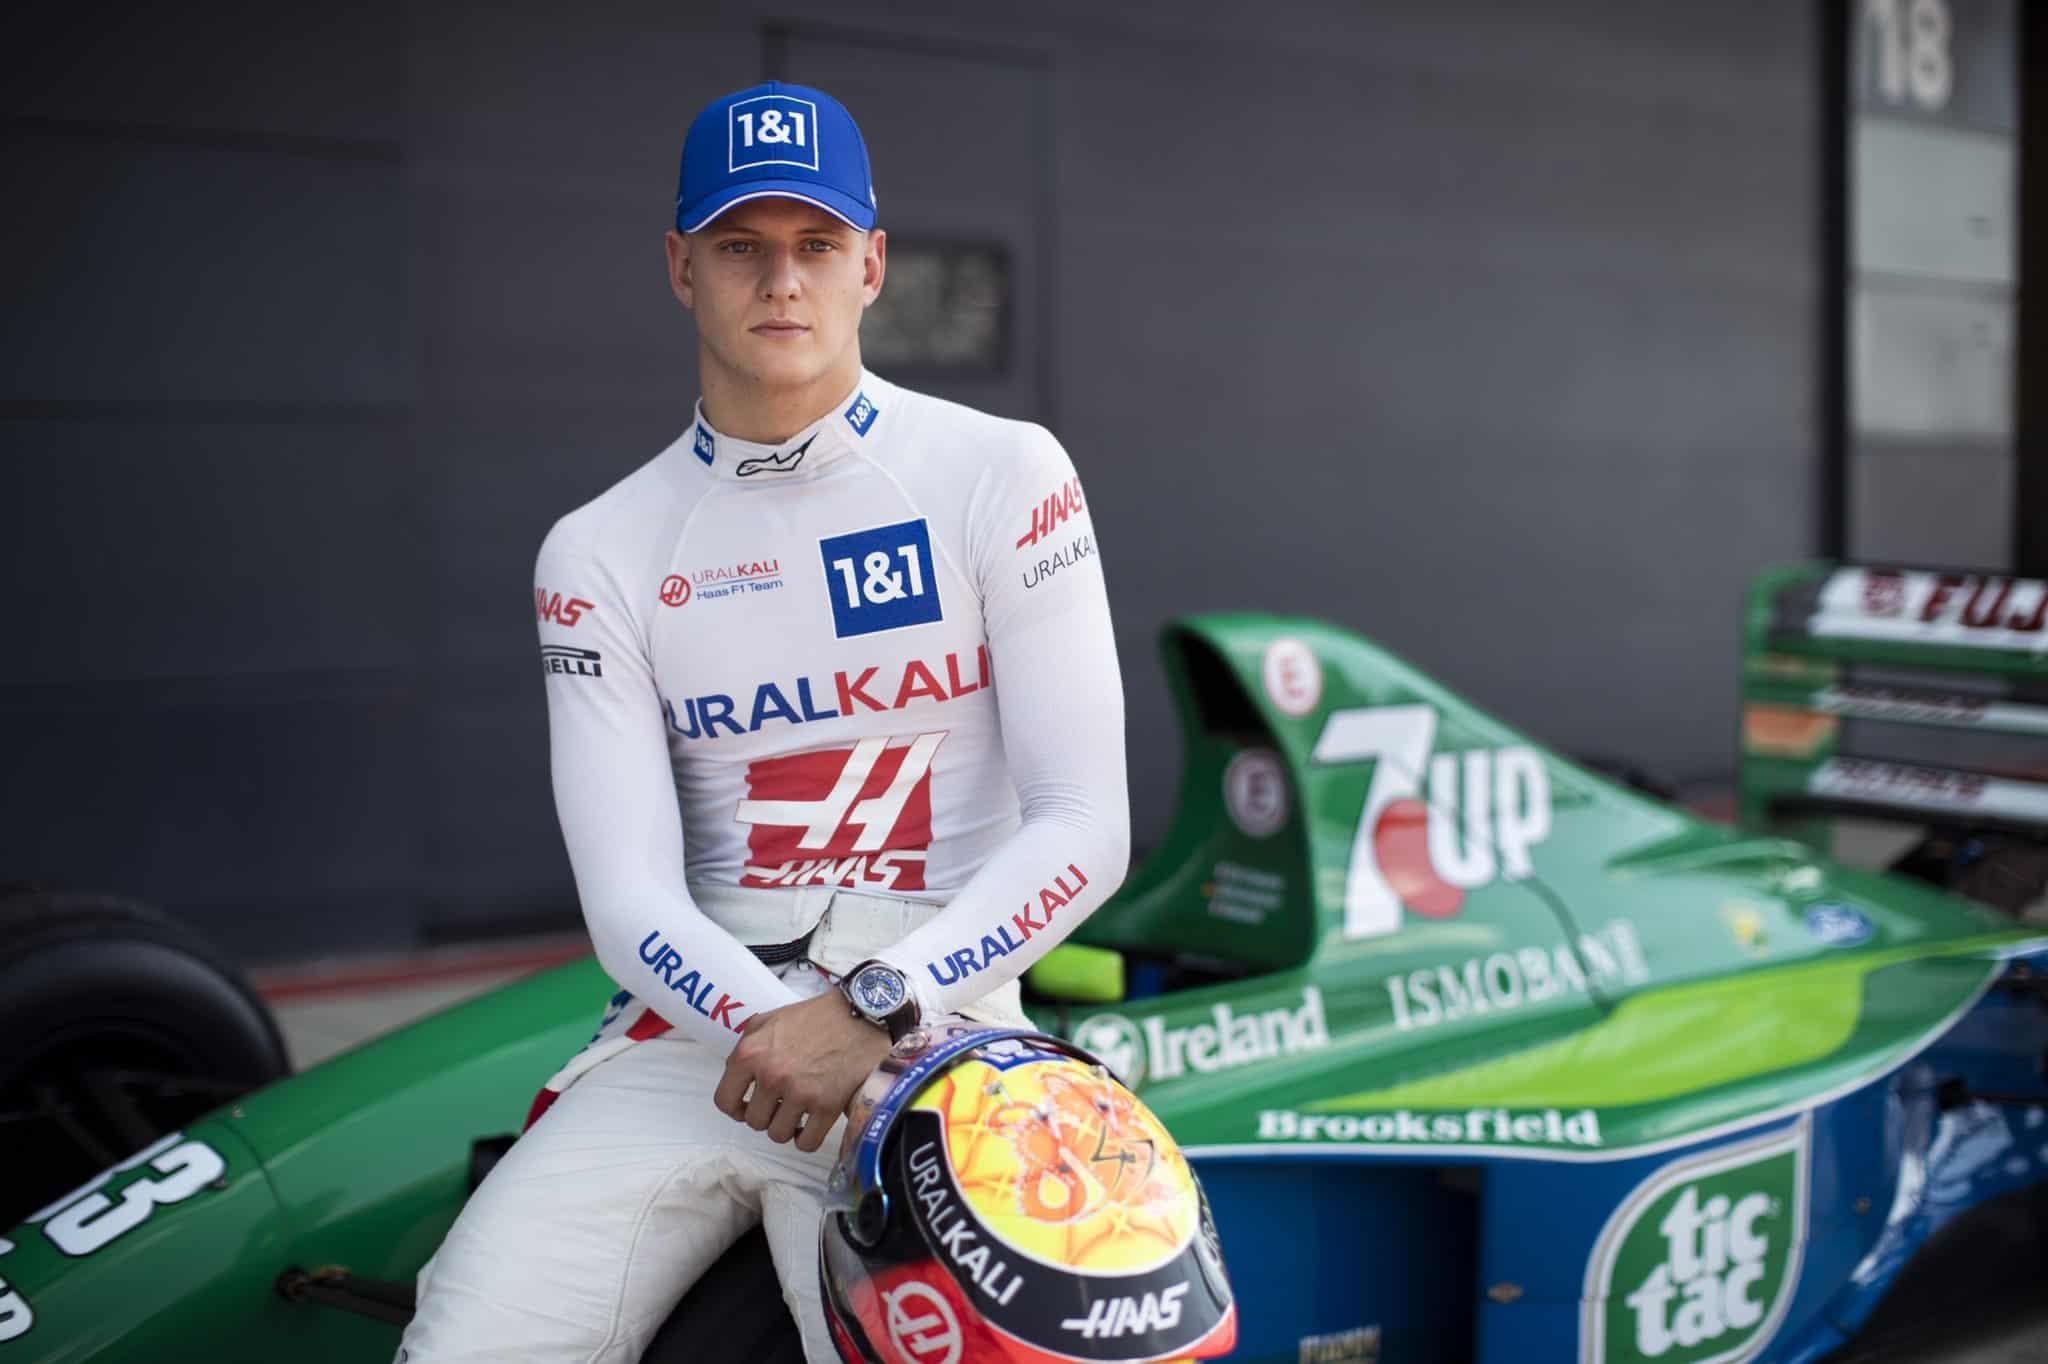 2021 British GP Mick Schumacher Jordan 191 Photo Haas